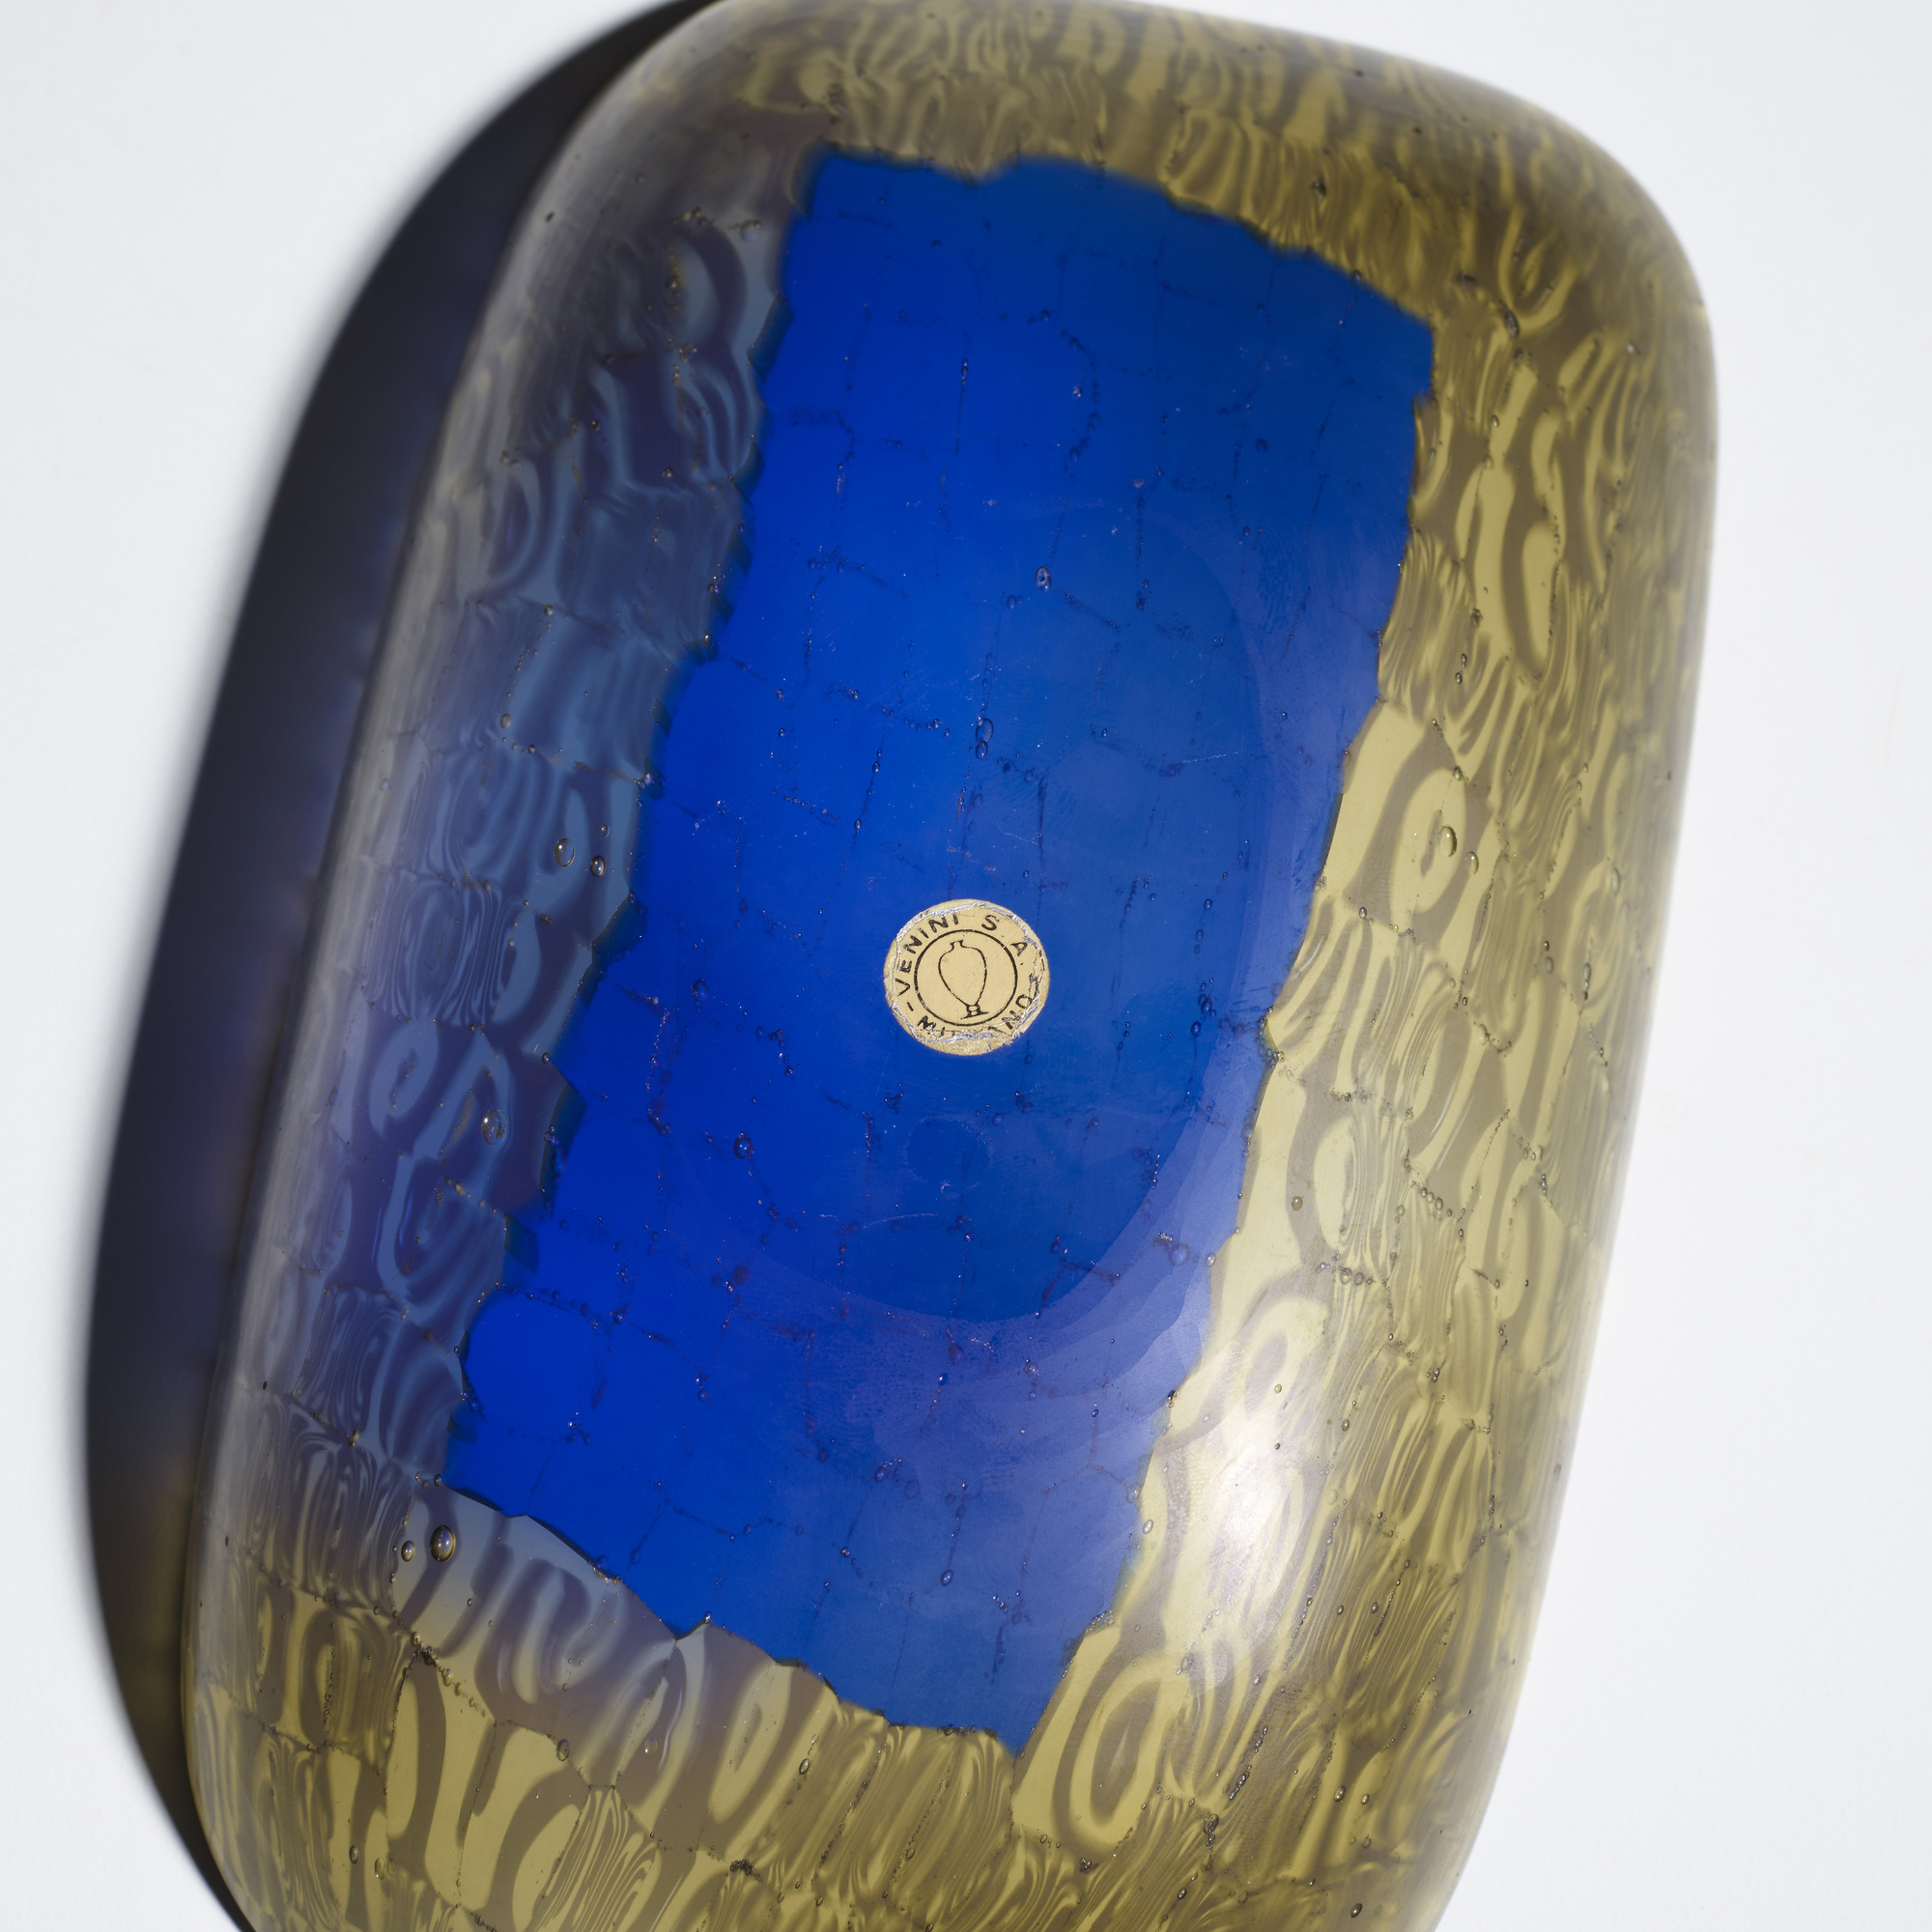 151: Paolo Venini / a Murrine plate, model 4881 (2 of 2)